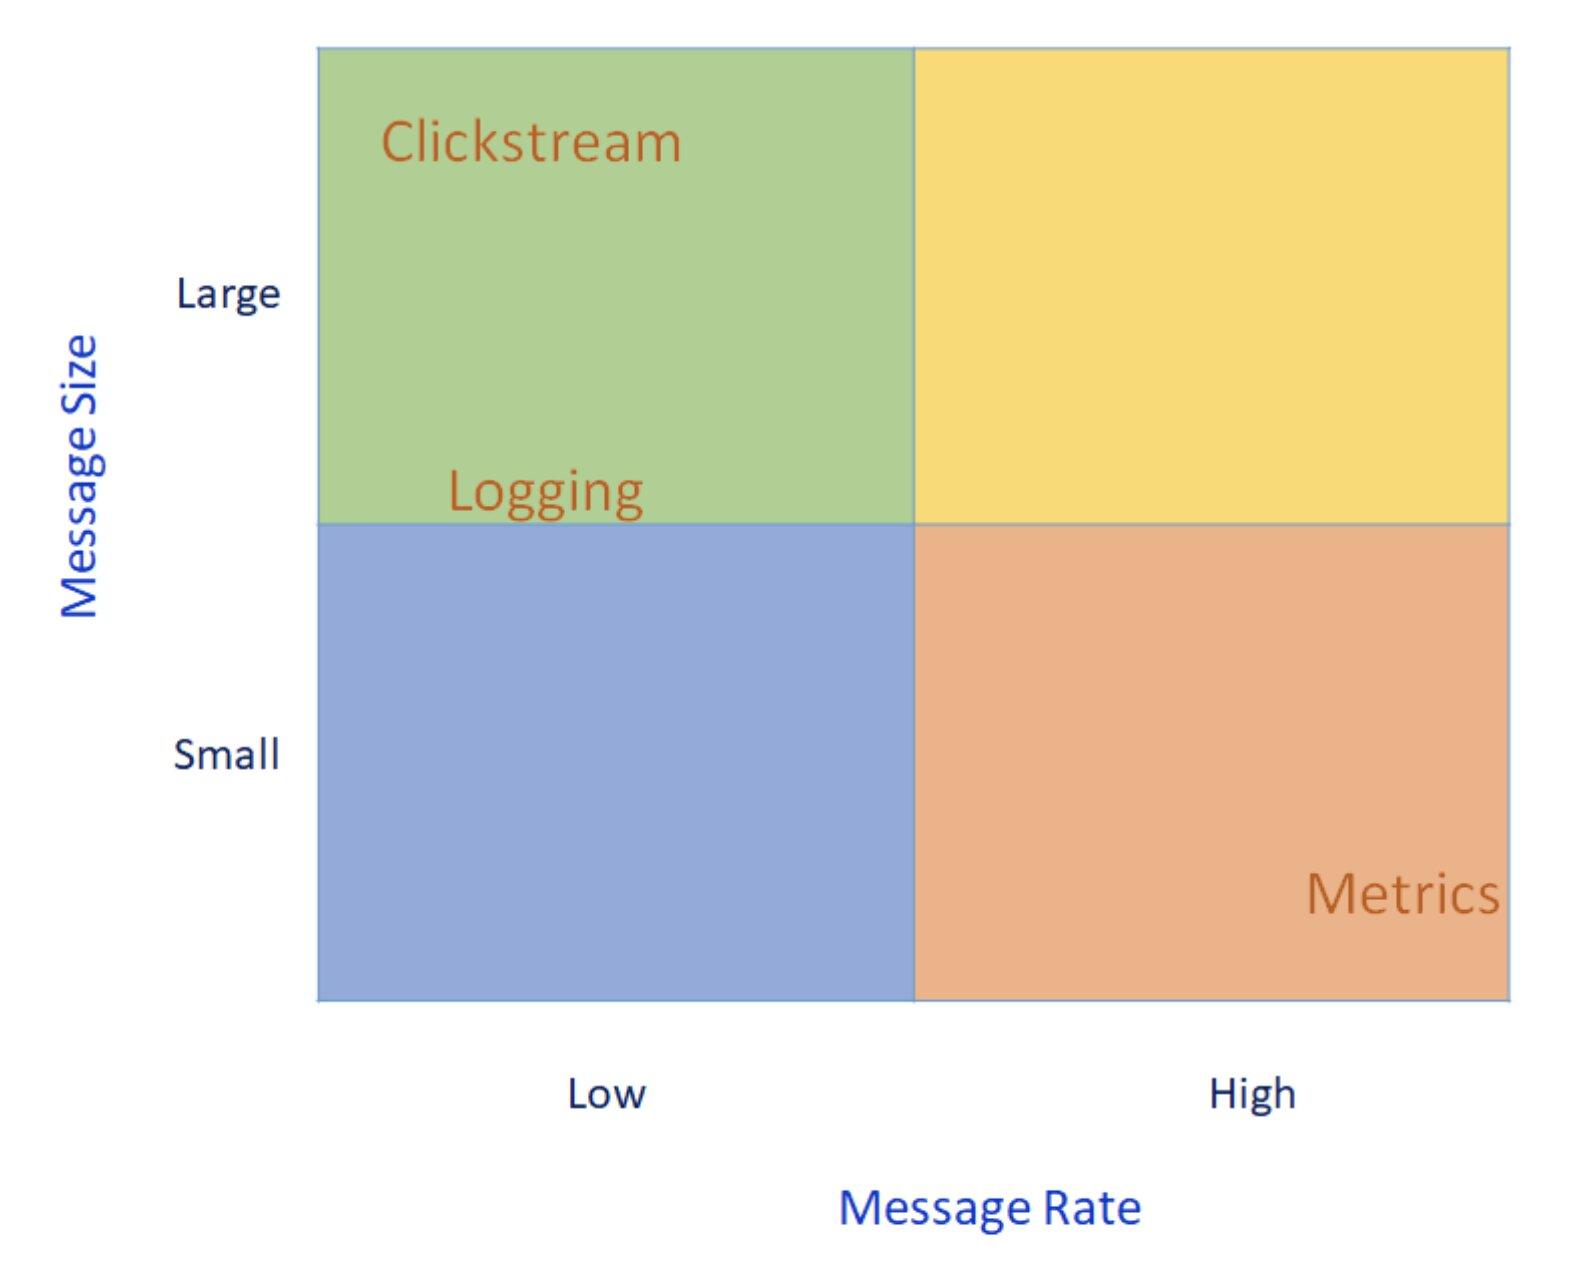 Figure 5: 2X2 load profile matrix of Logging, Metrics, Clickstream workloads